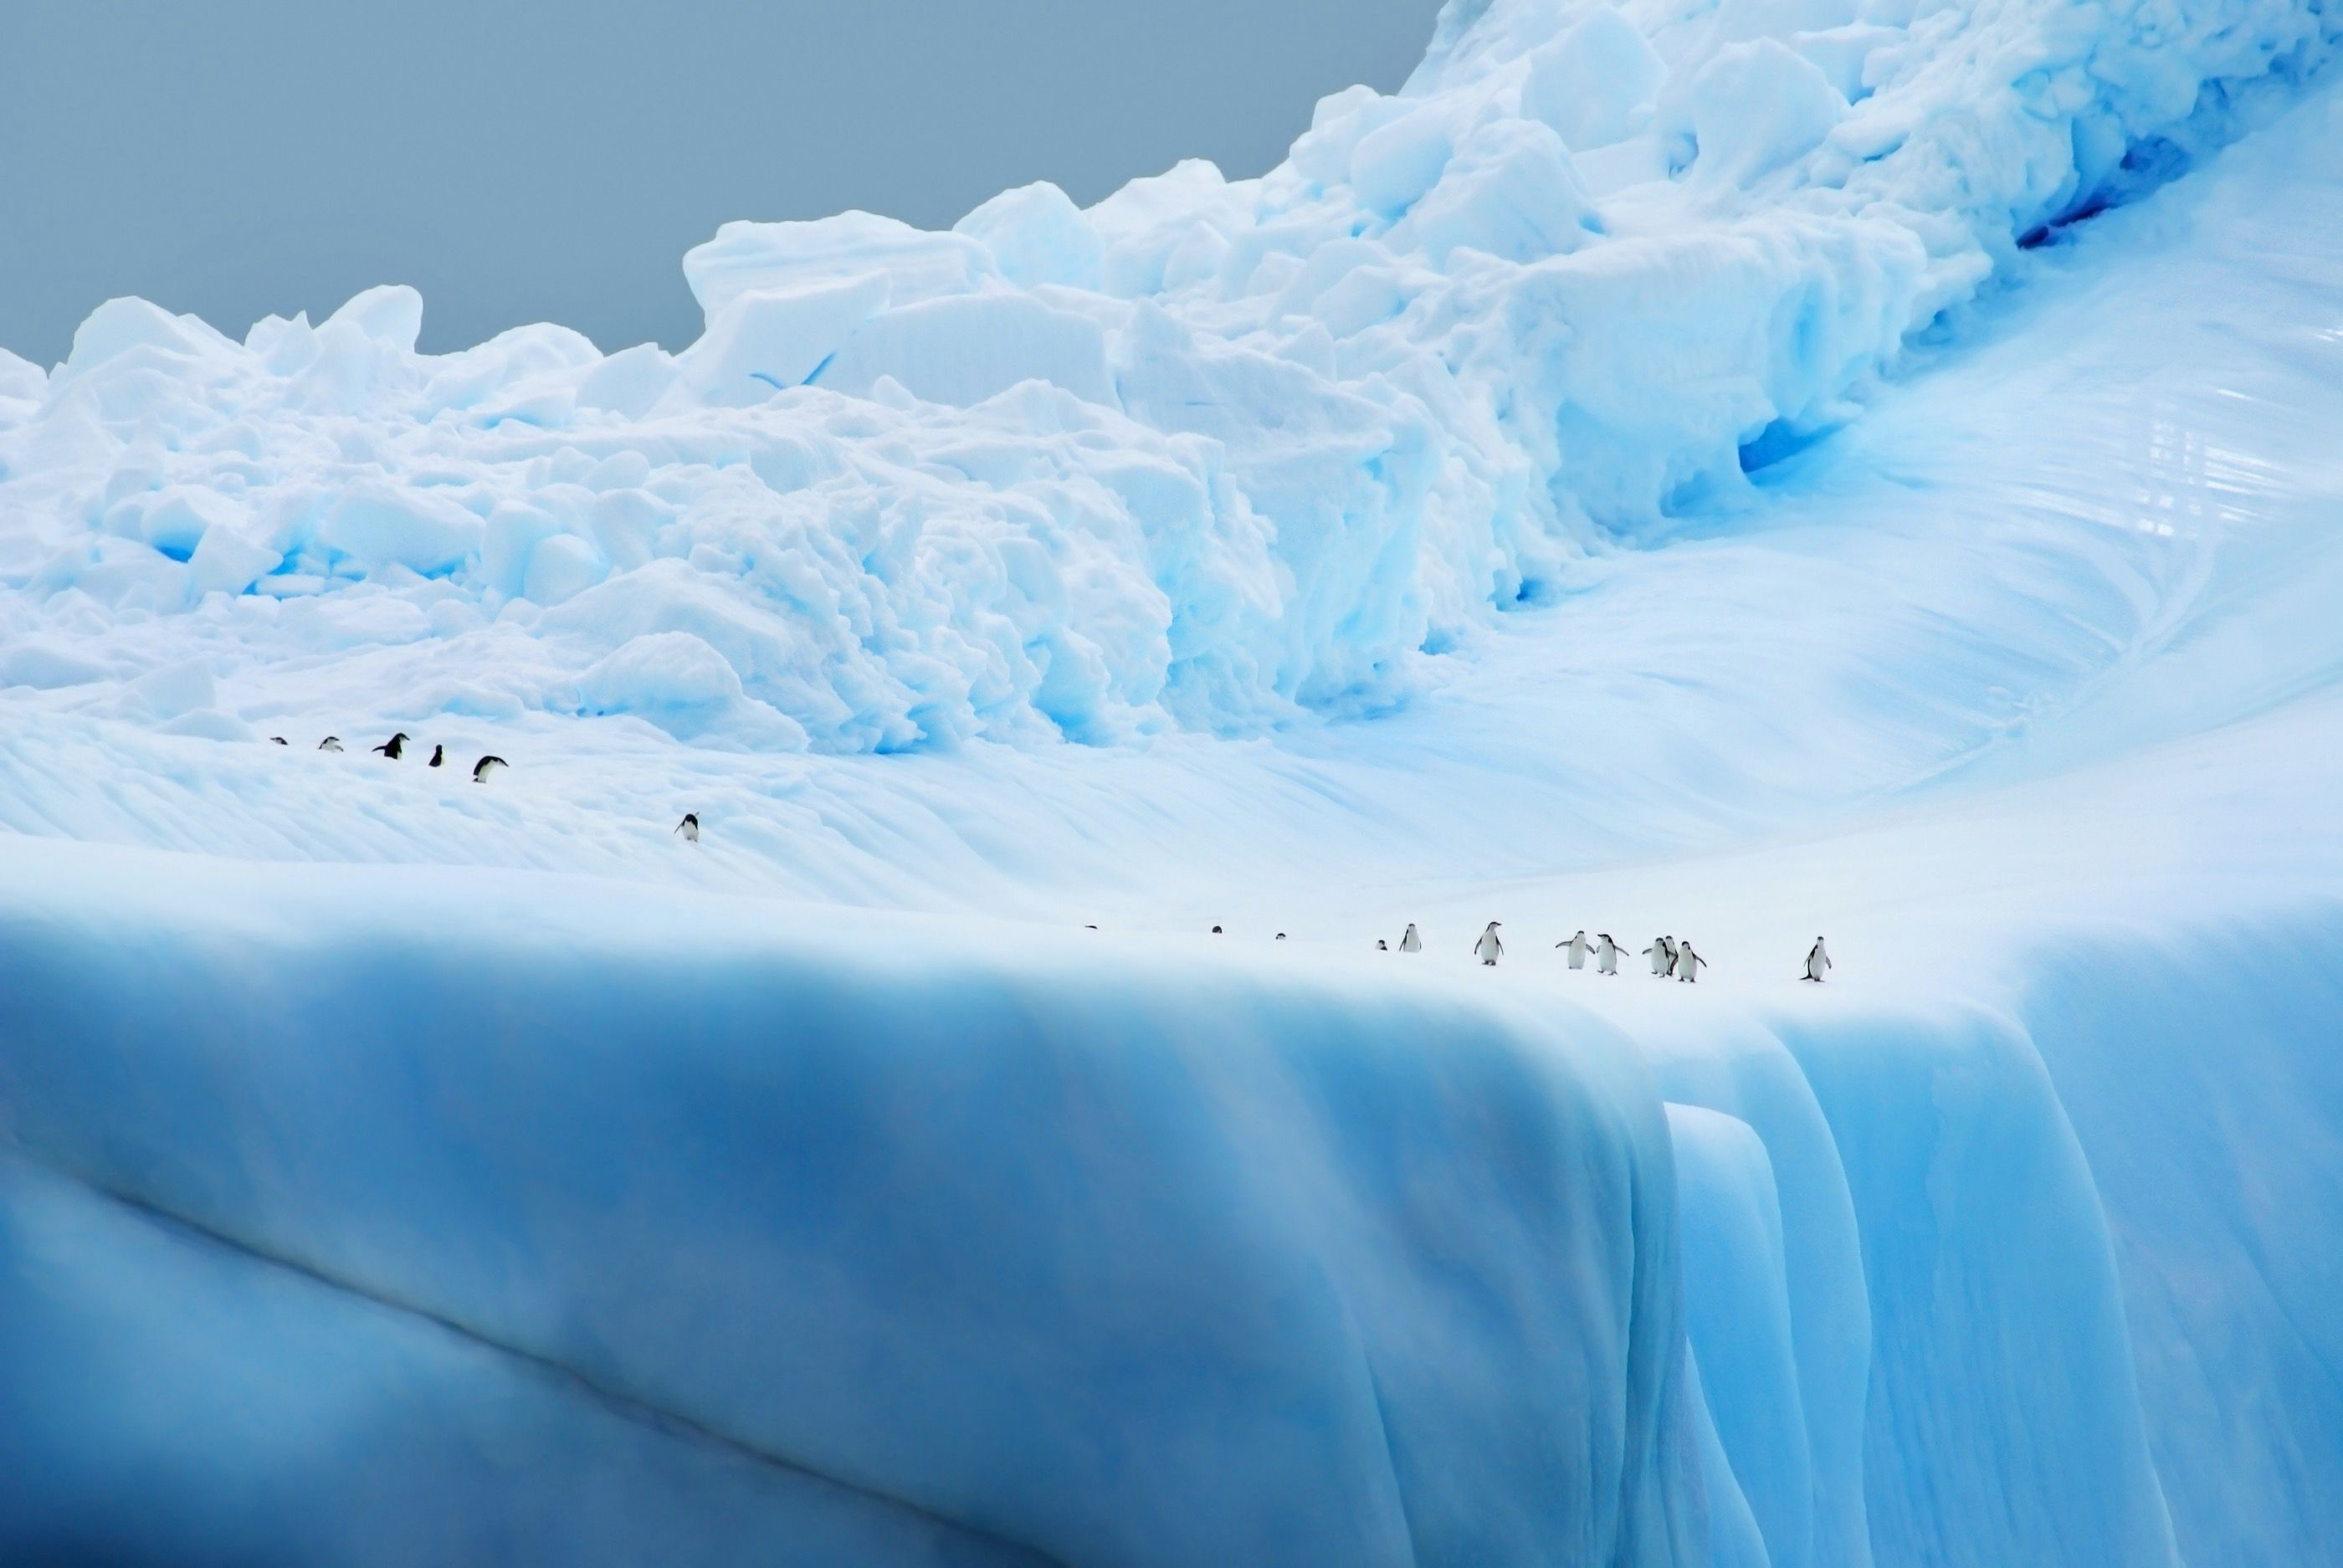 Gerlache Strait, Antarctica (Christian Wilkinson)